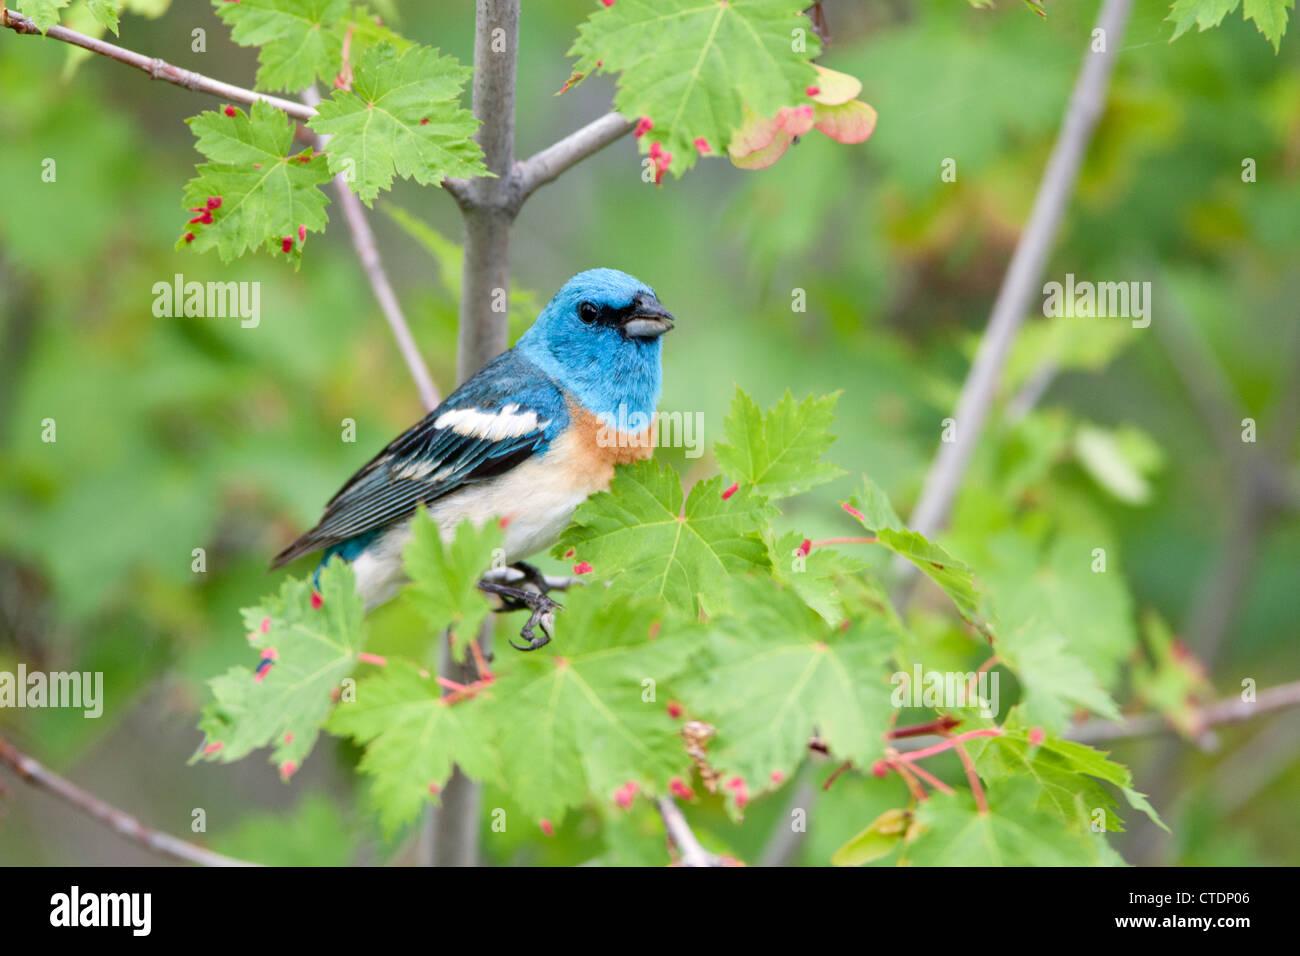 Lazuli Bunting in Maple Tree - Stock Image